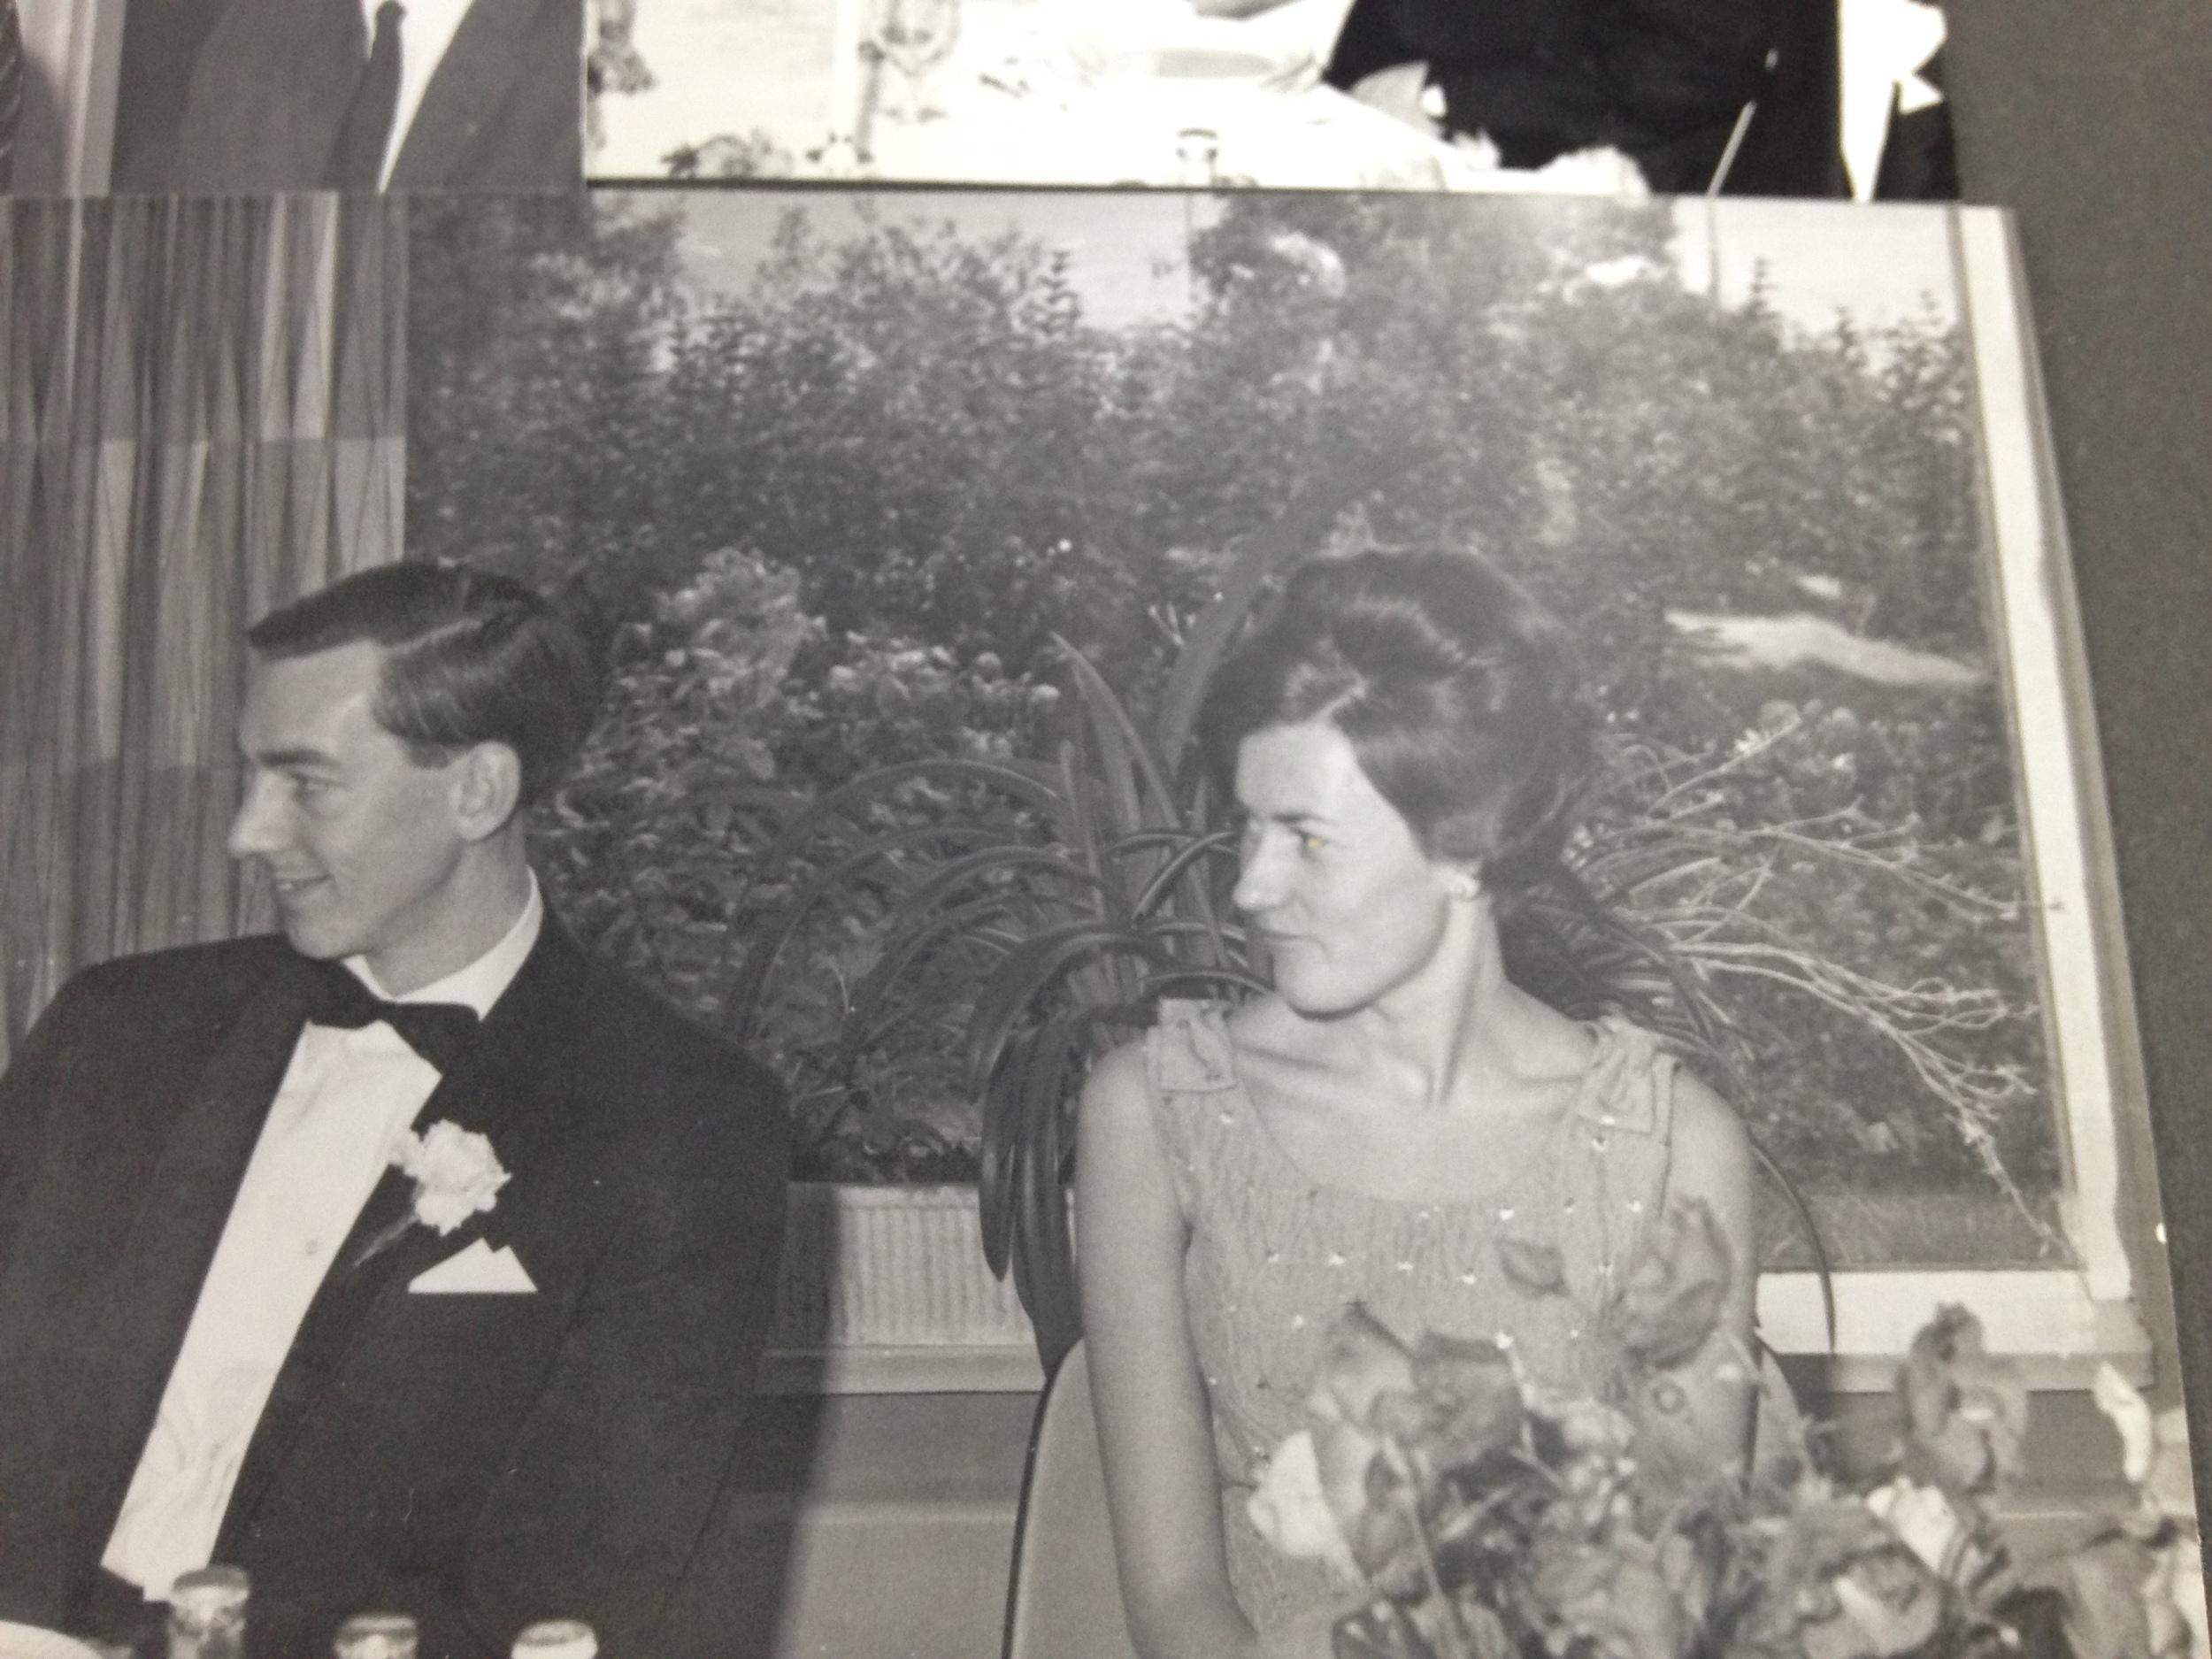 My grandparents at a wedding.